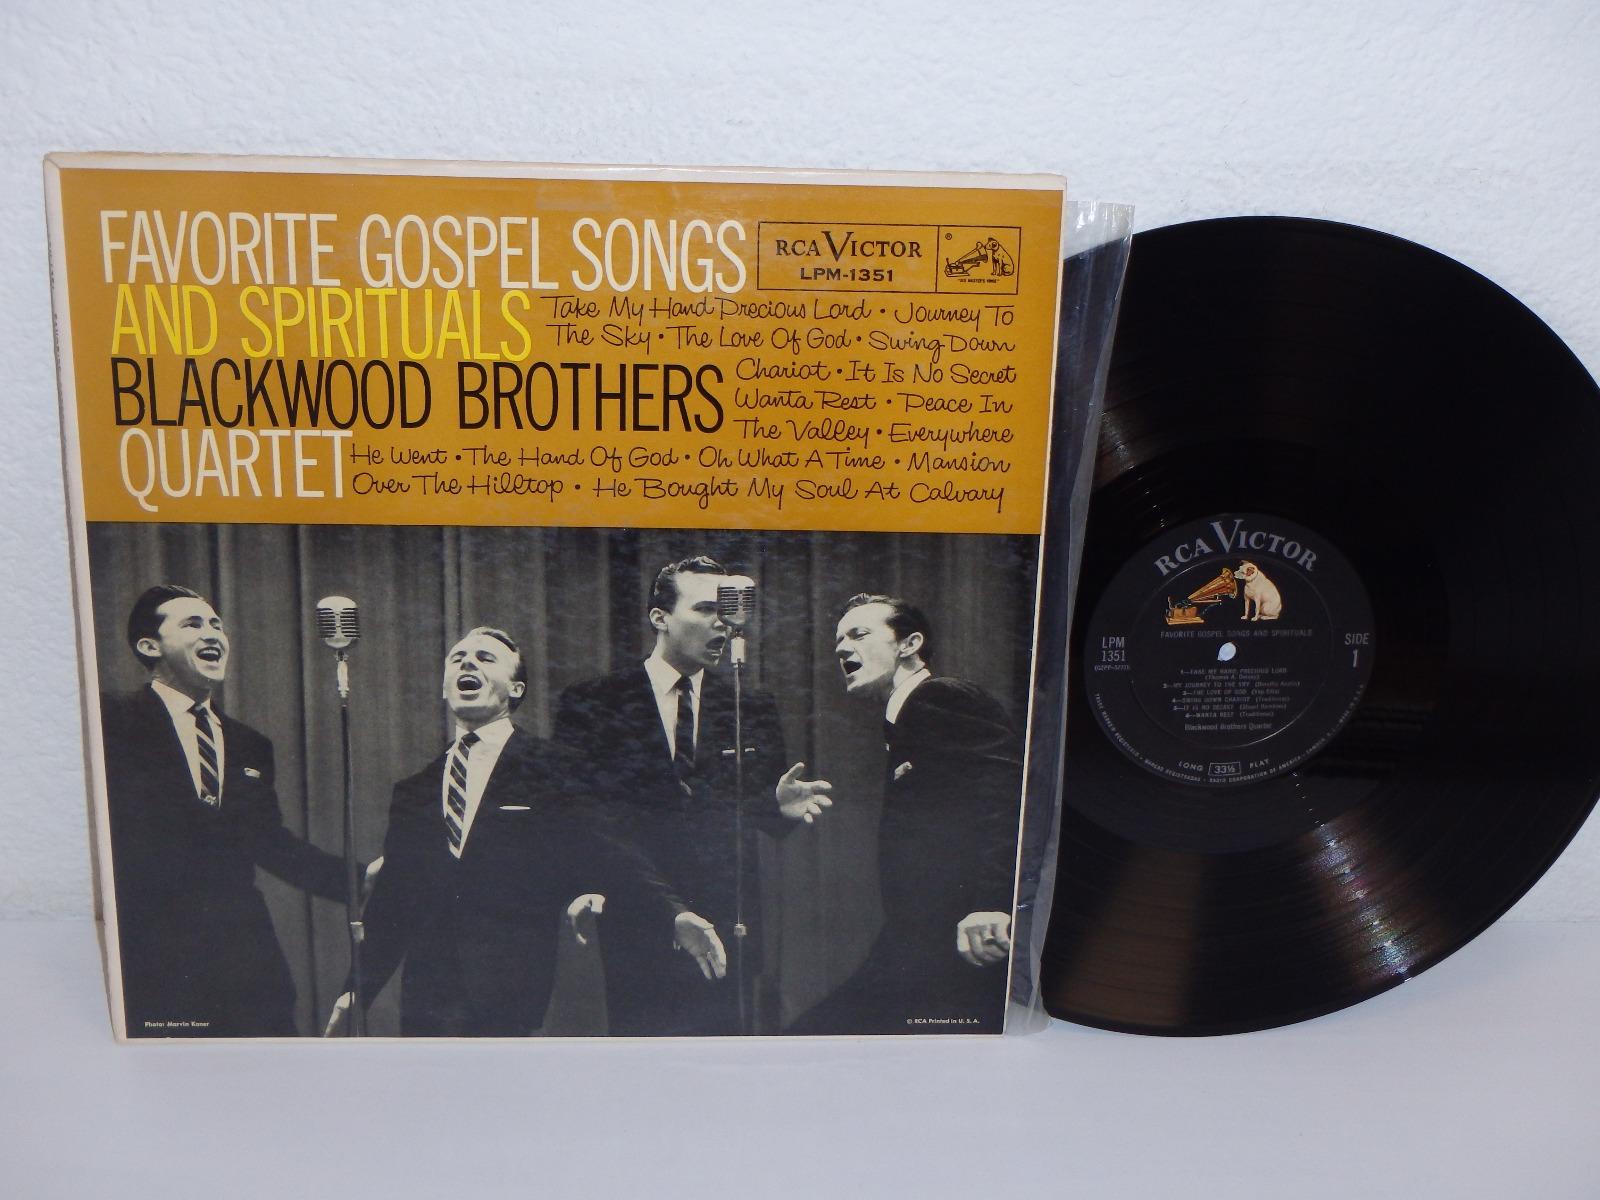 Favorite gospel songs